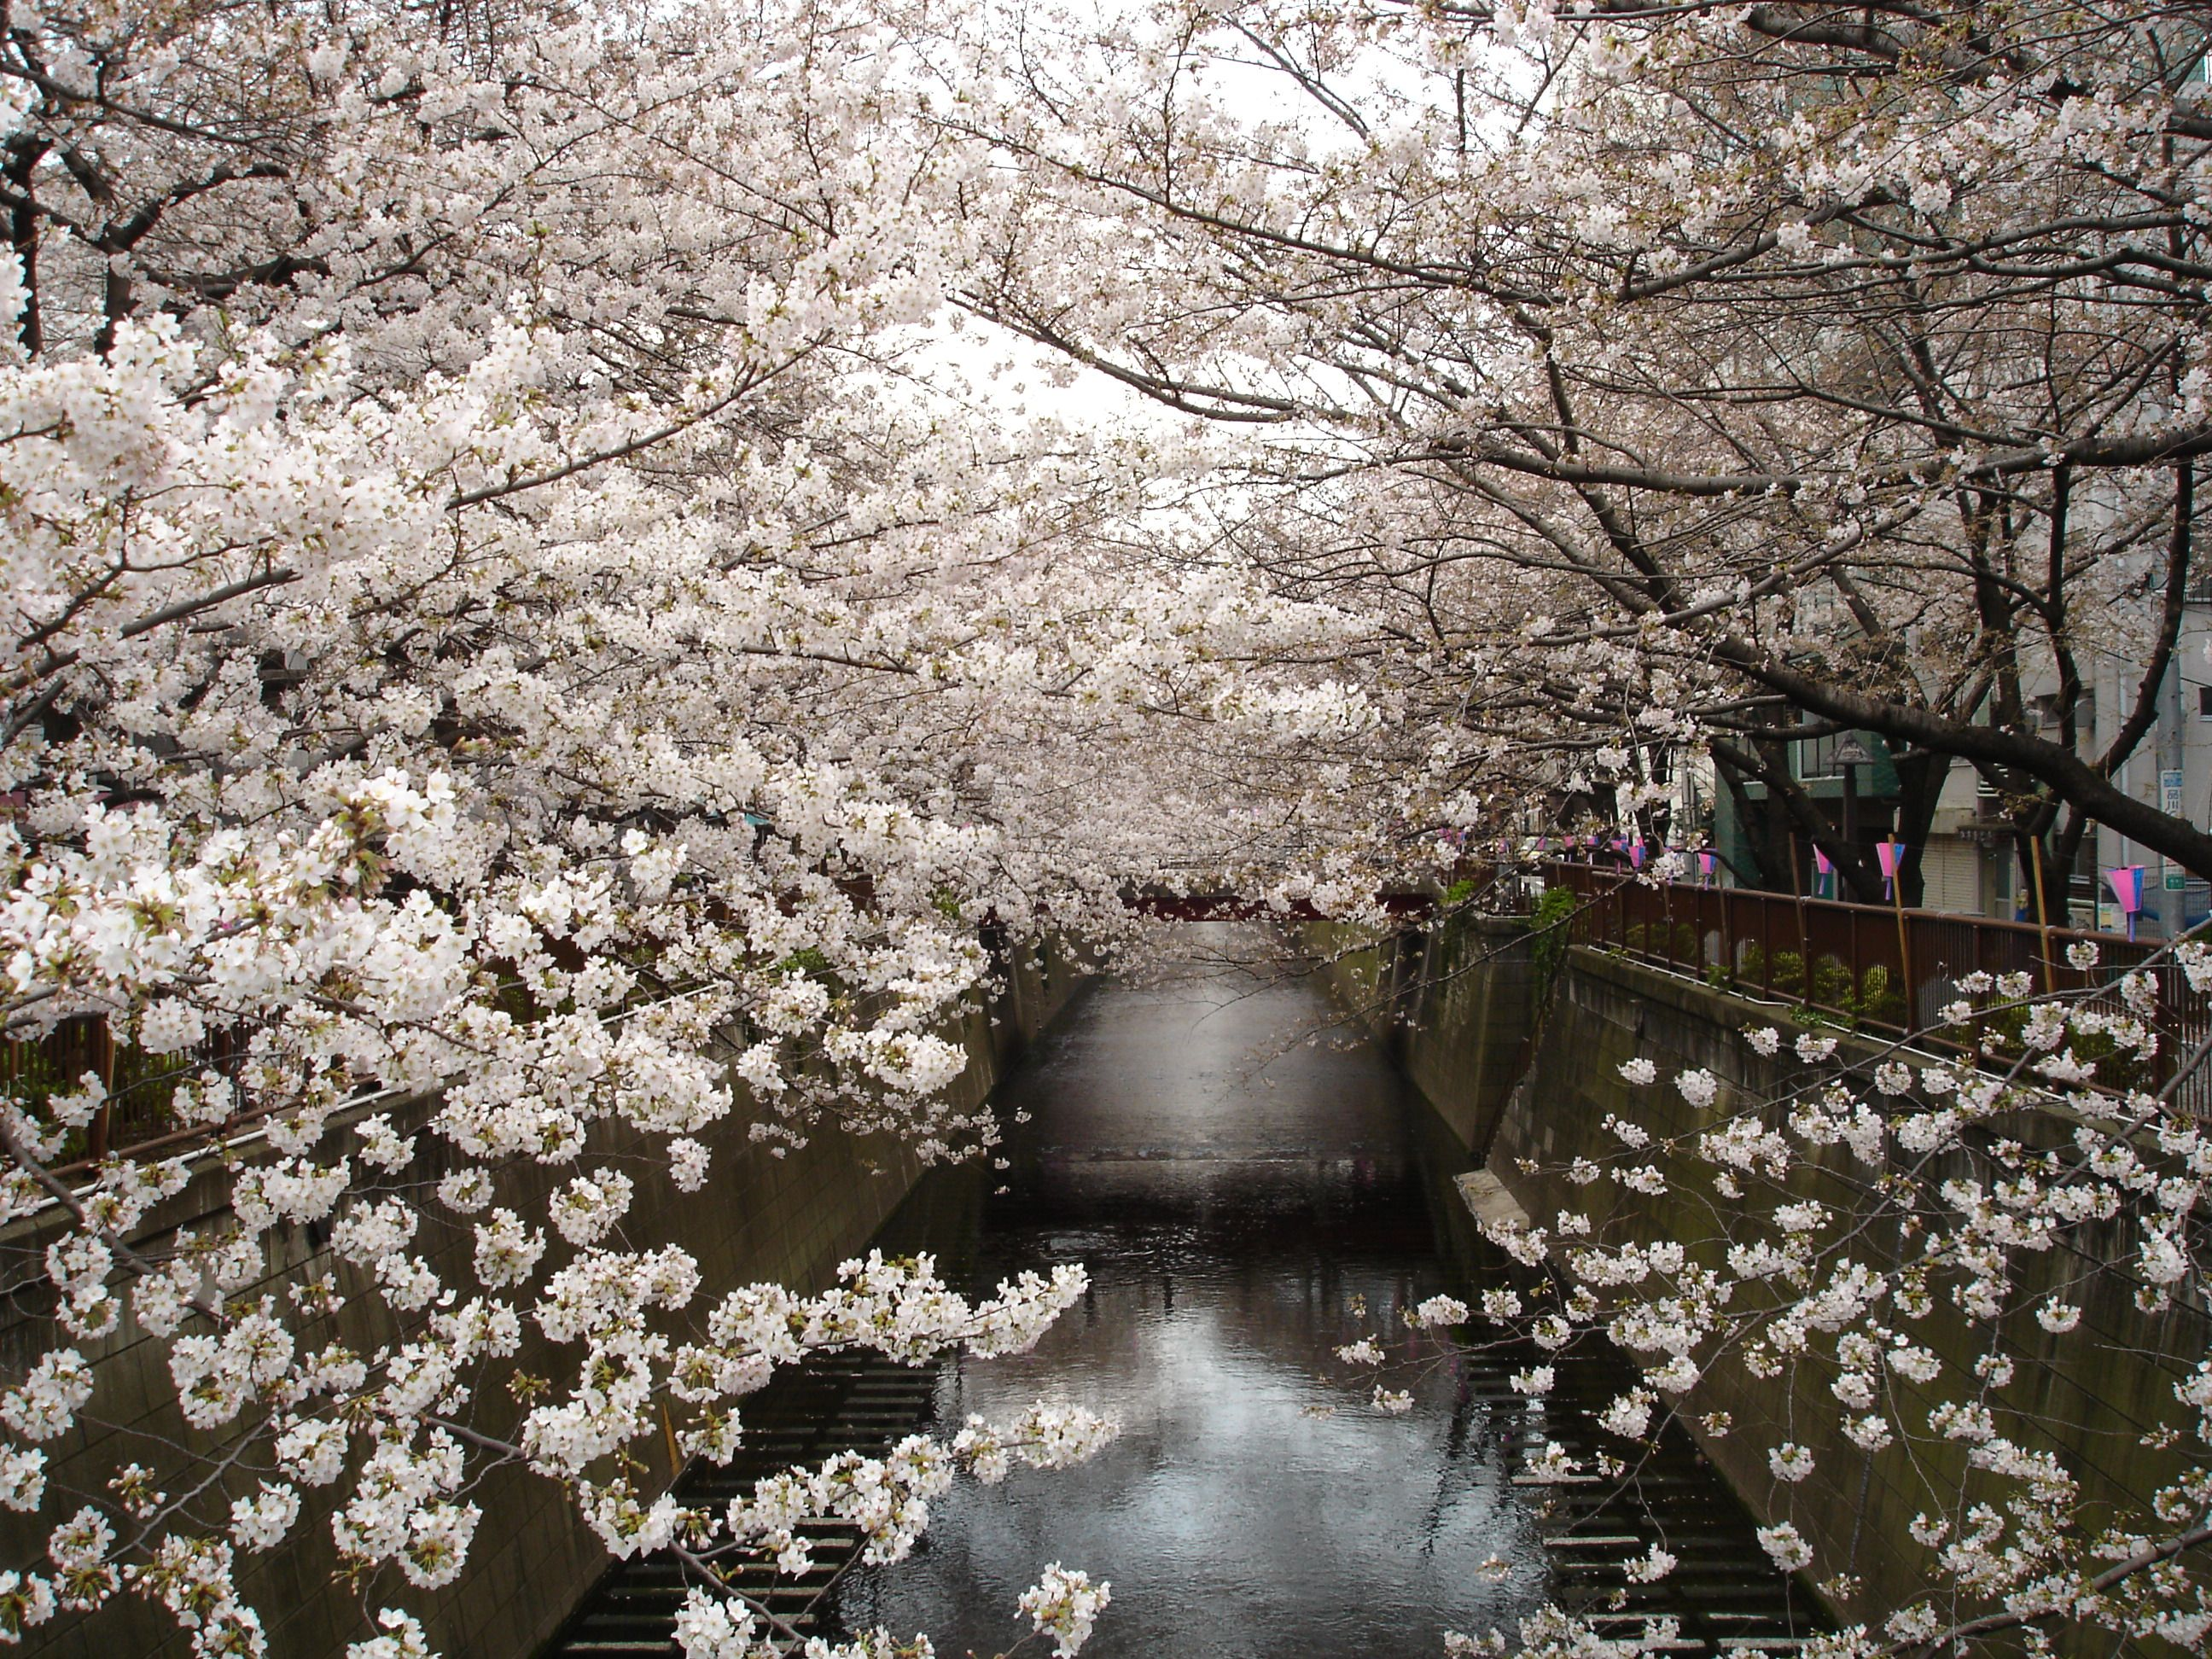 Japan Cherry Blossom Trees Flowers Wallpaper 668973 Wallbase Cc Cherry Blossom Japan Cherry Blossom Tree Blossom Trees